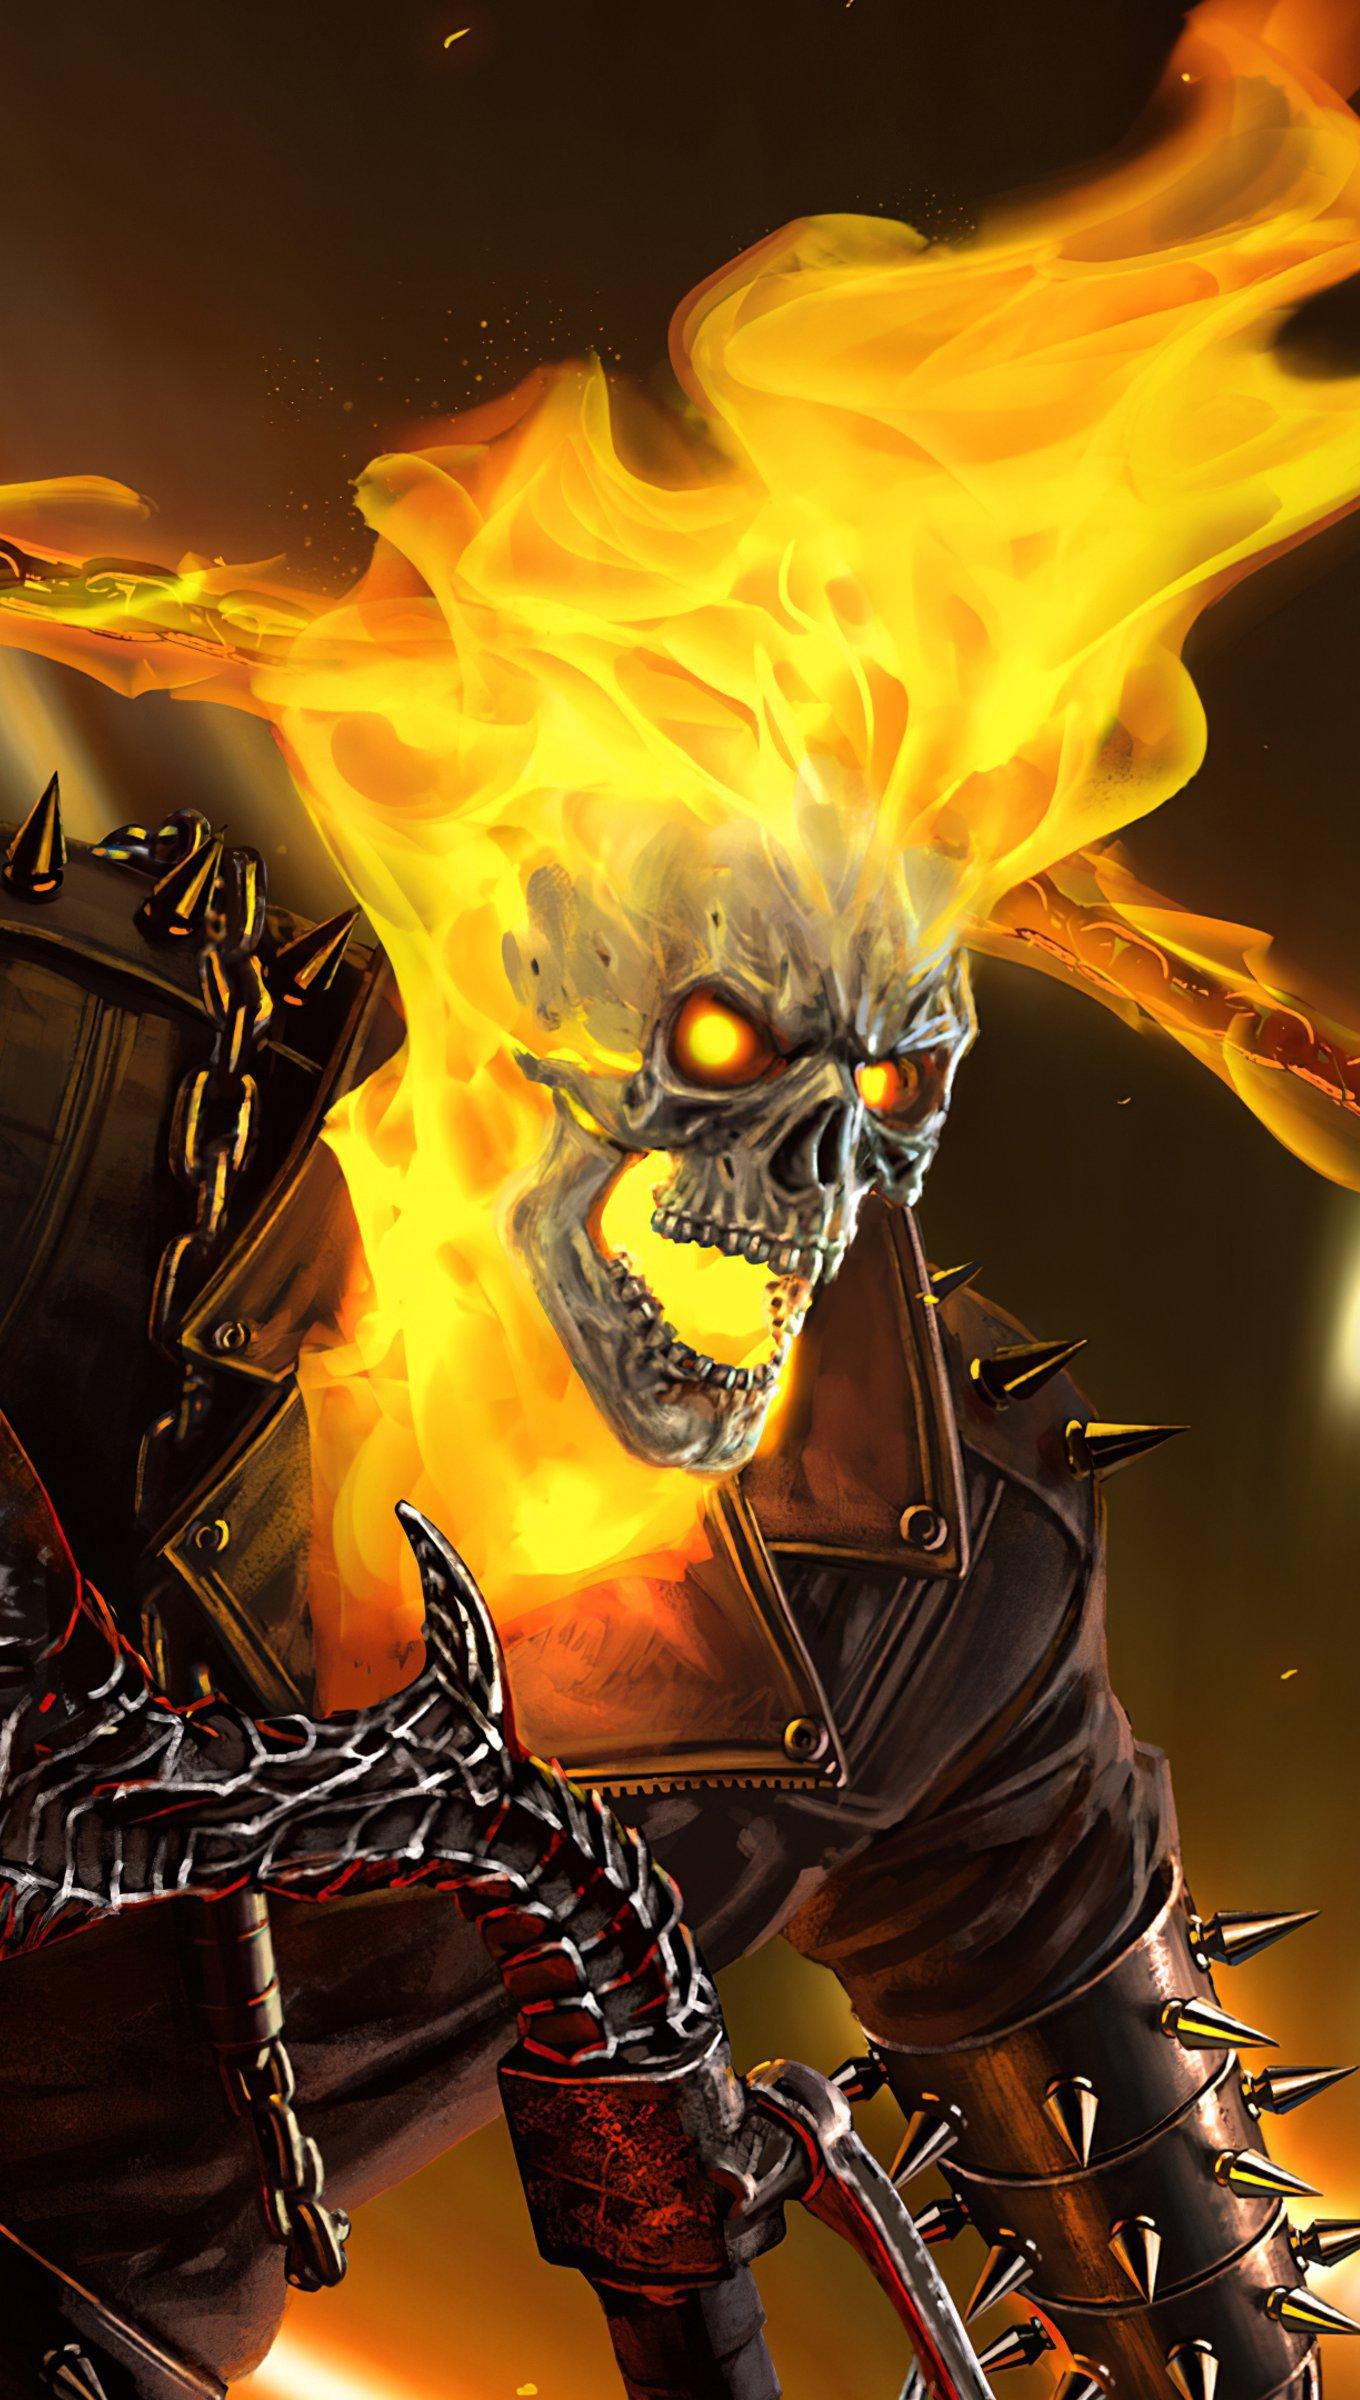 Fondos de pantalla Ghost Rider Vertical